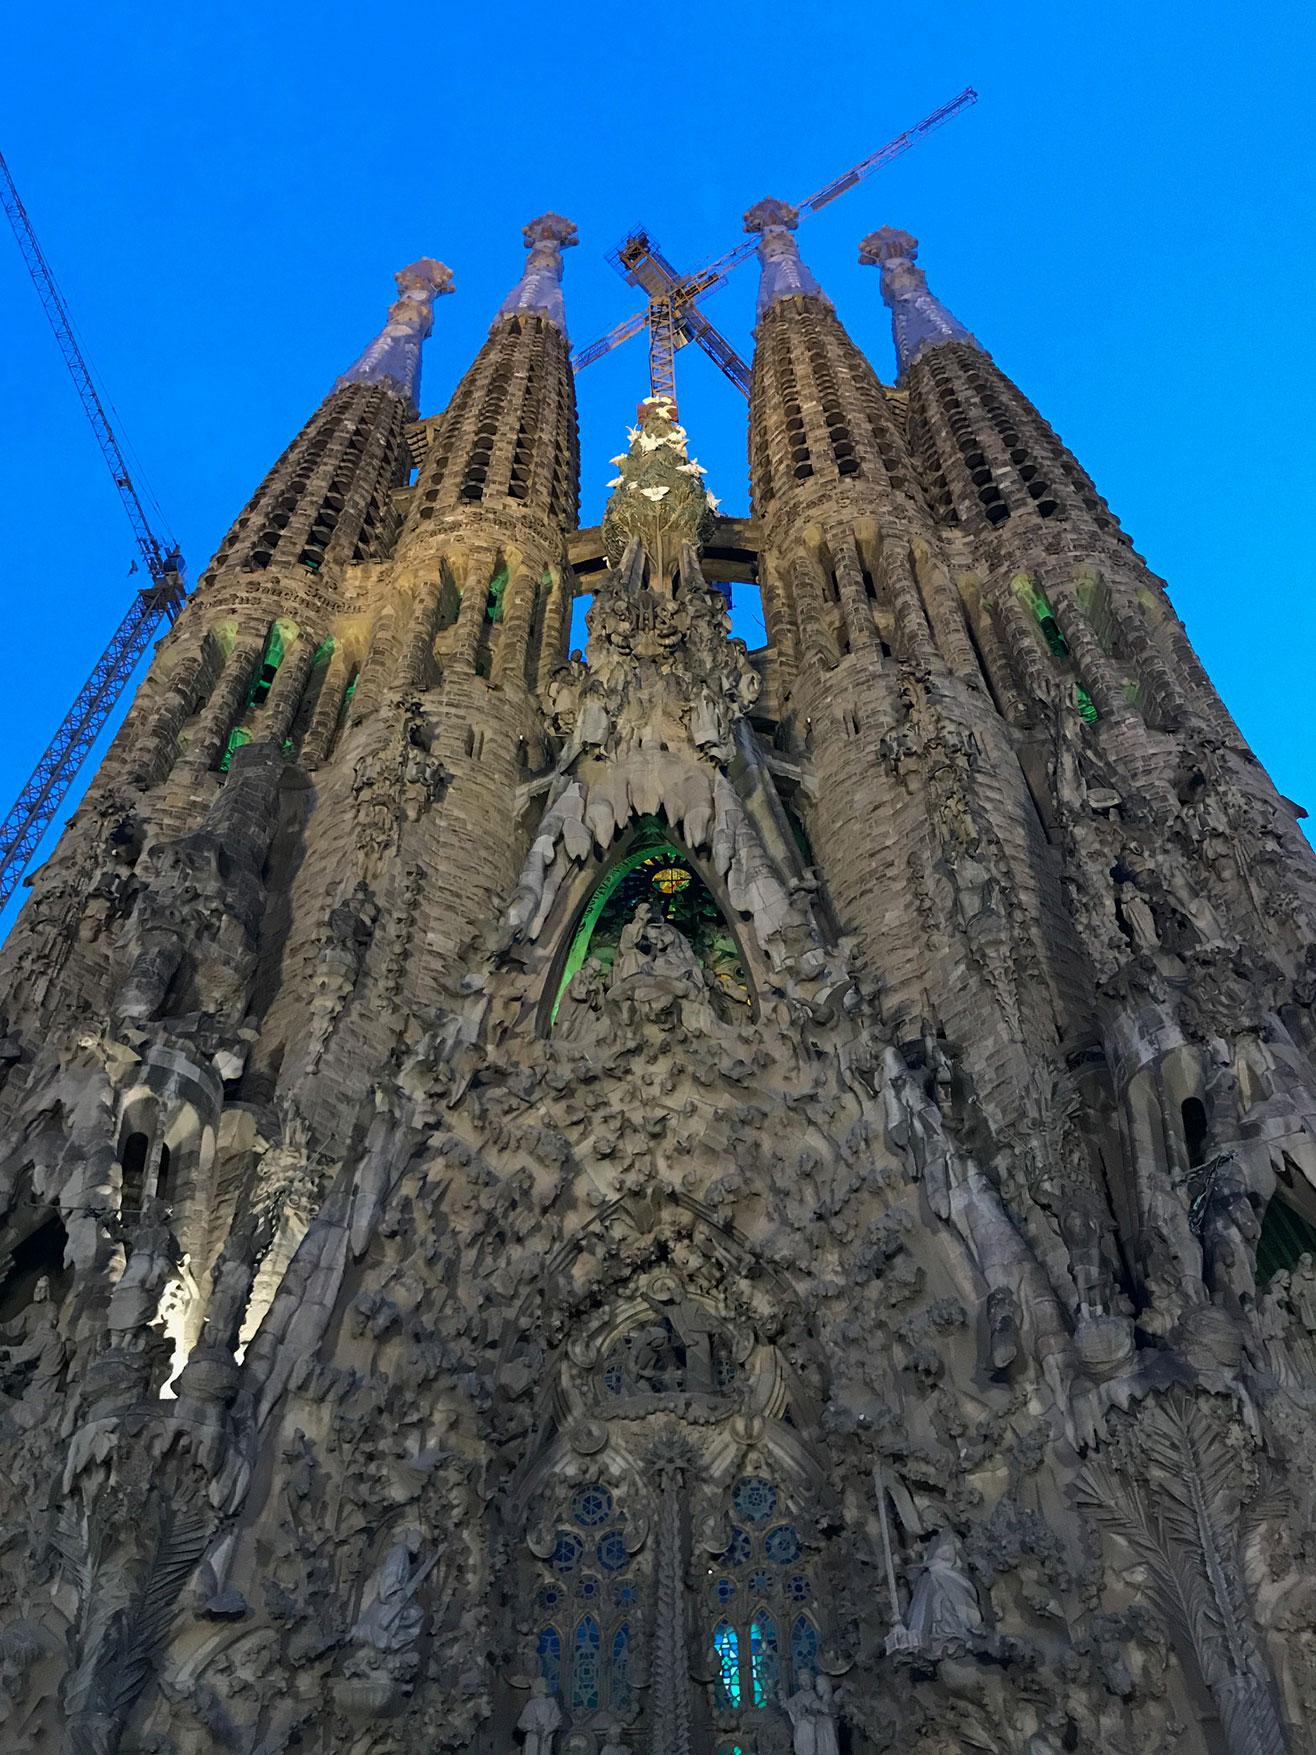 Templo Sagrada Familia